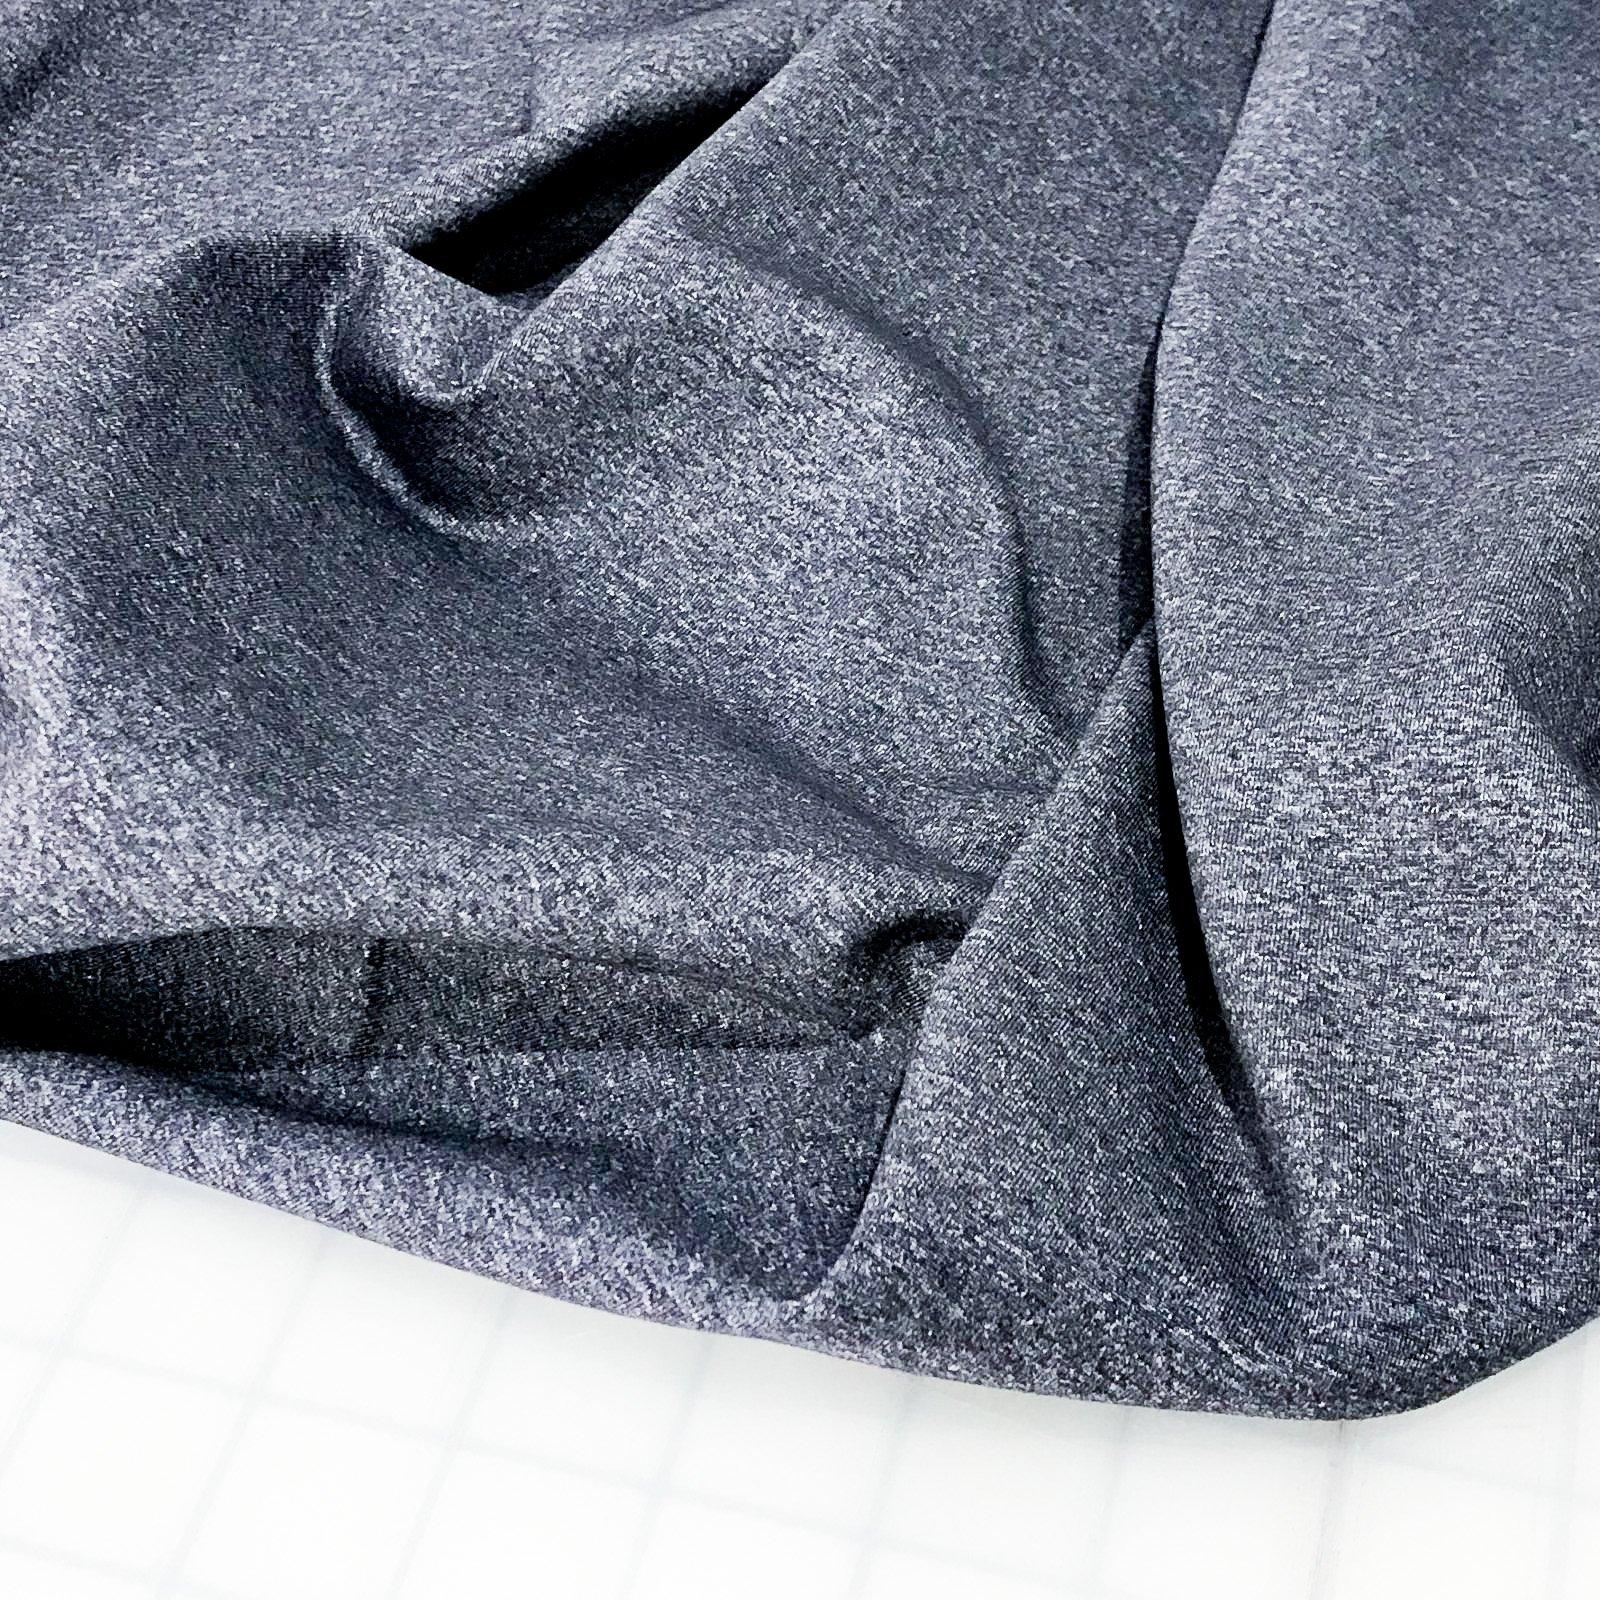 Dharma Stretch Supplex - Heathered Denim Blue